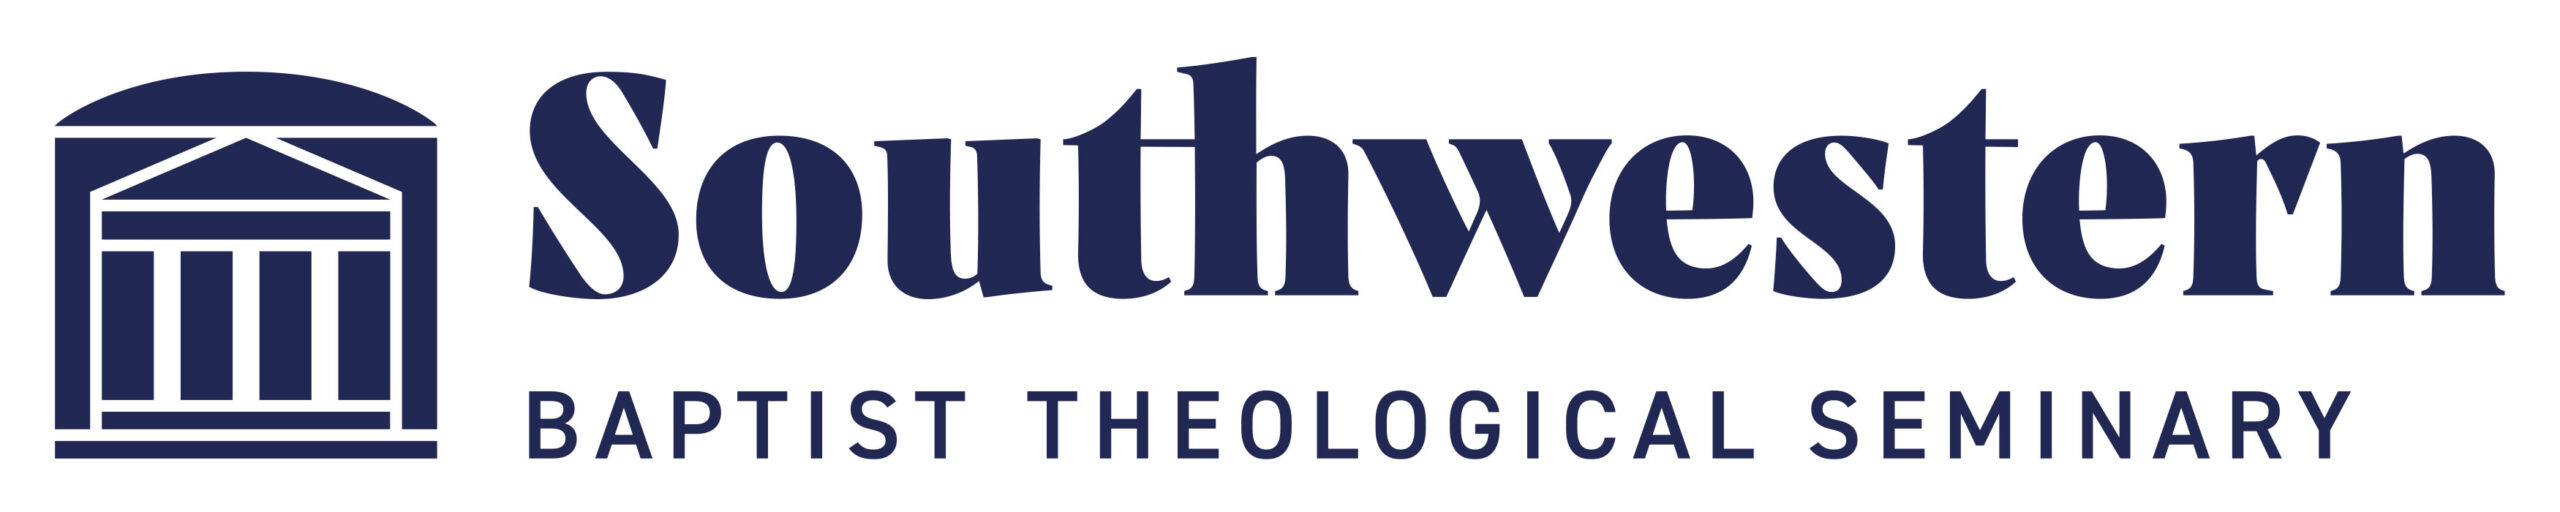 SWBTS-Logo - Jill Botticelli